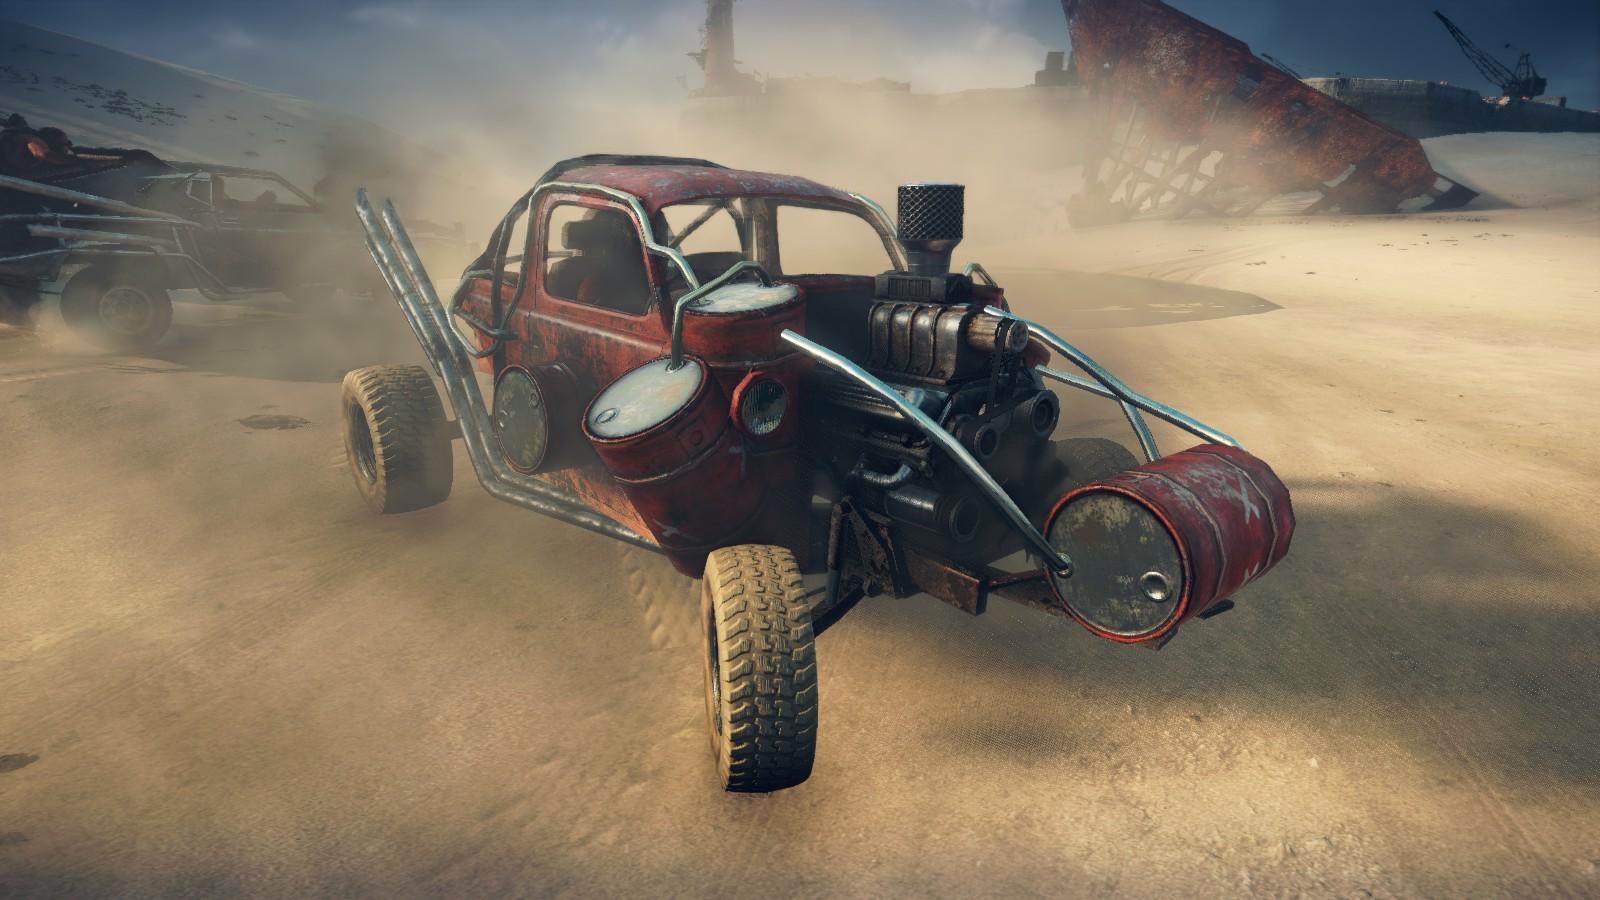 Igcdnet Volkswagen In Mad Max